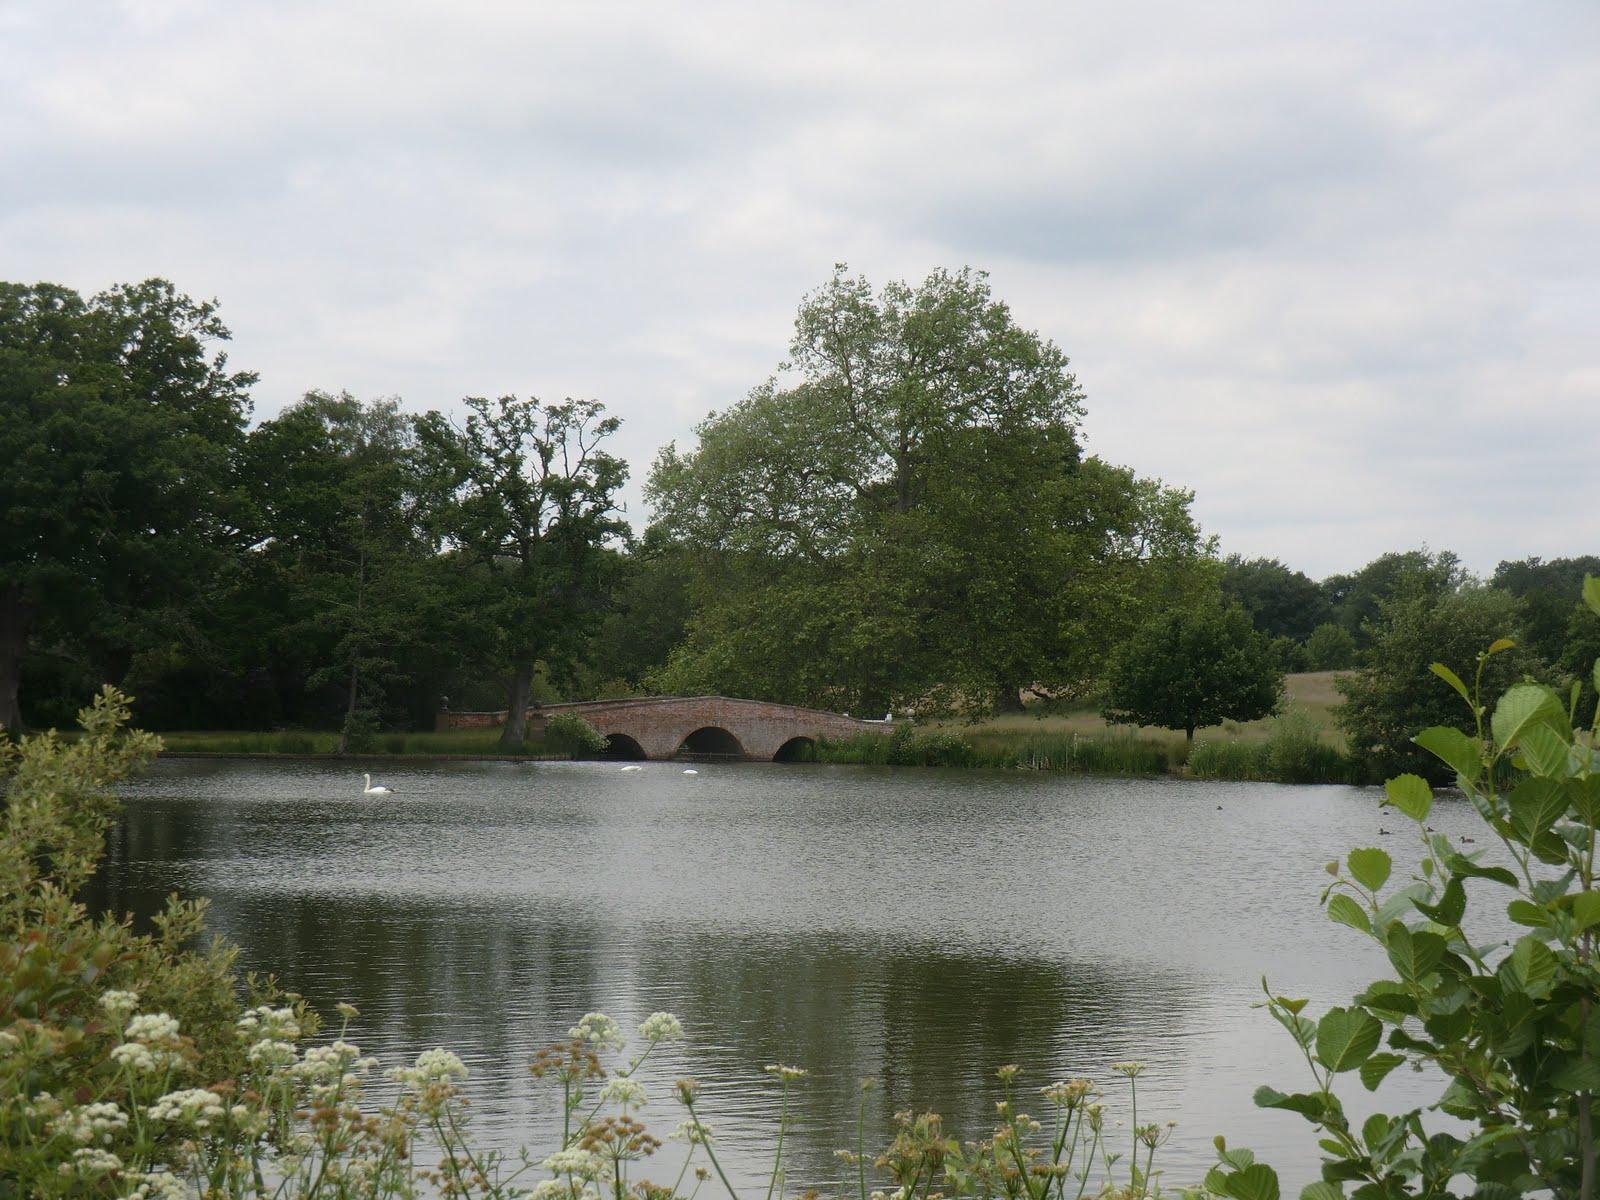 CIMG8715 Tundry Pond